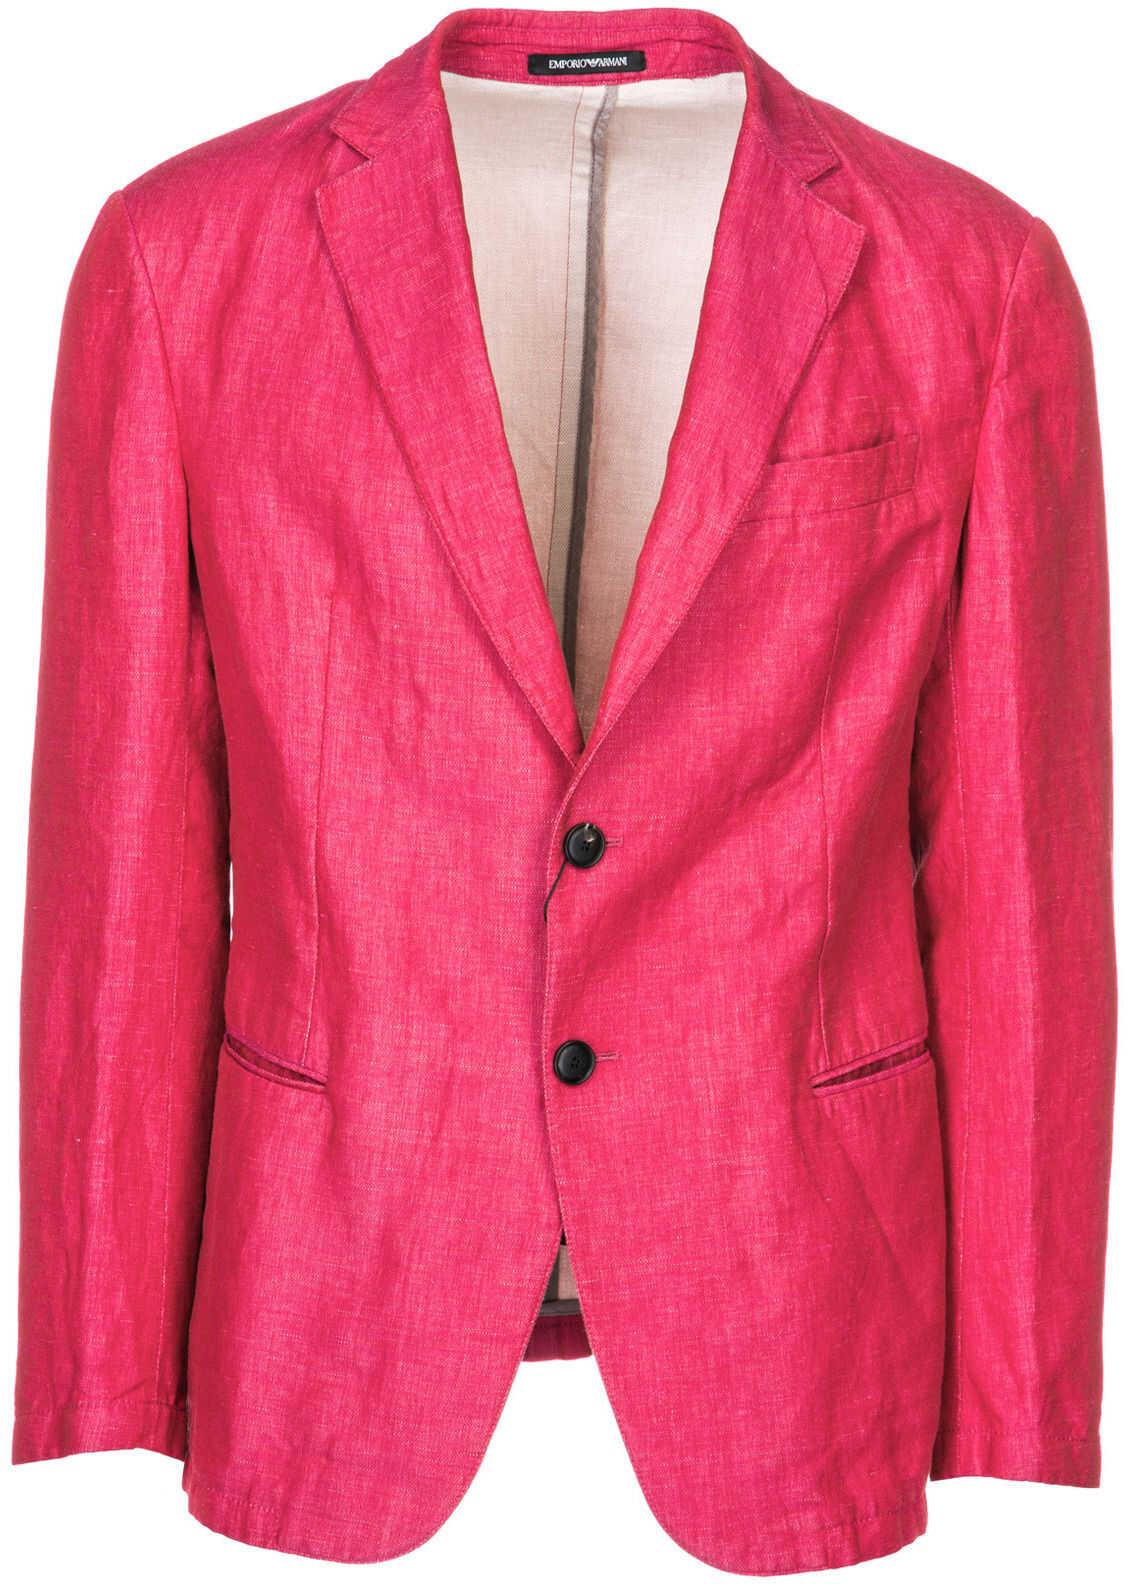 Emporio Armani Jacket Blazer Pink